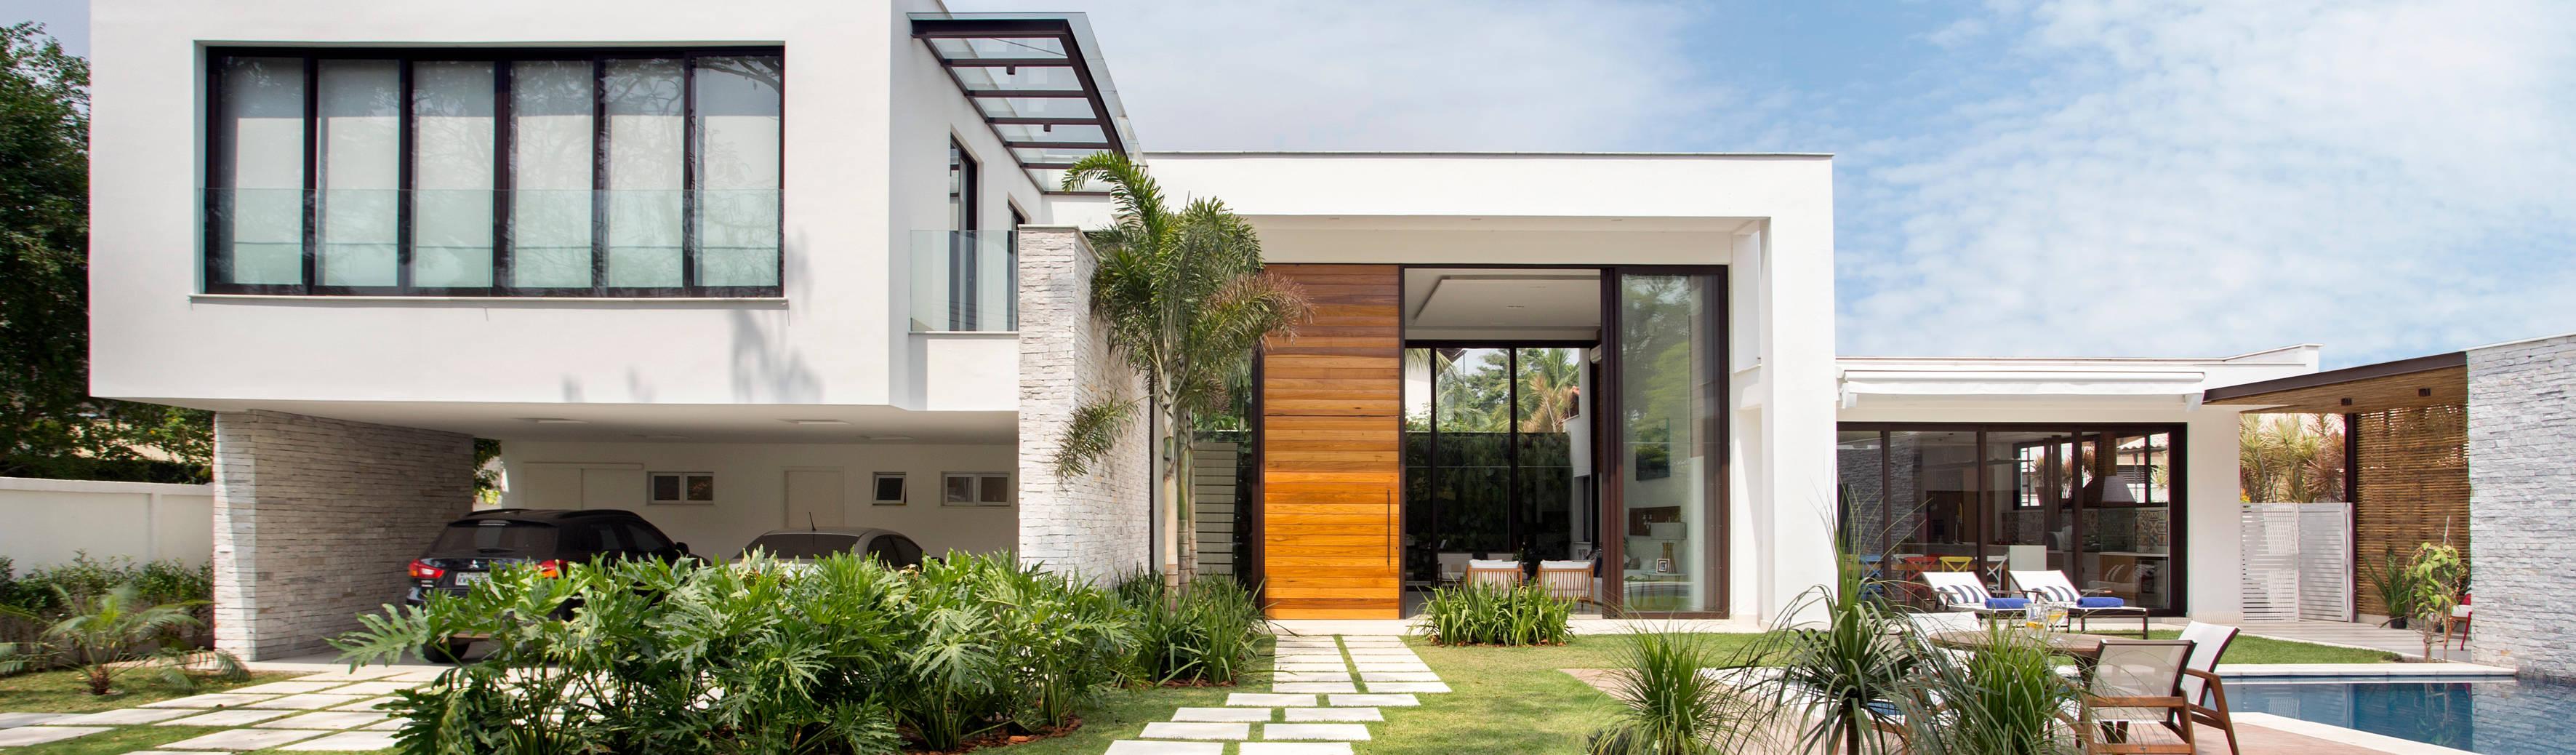 Amanda Miranda Arquitetura